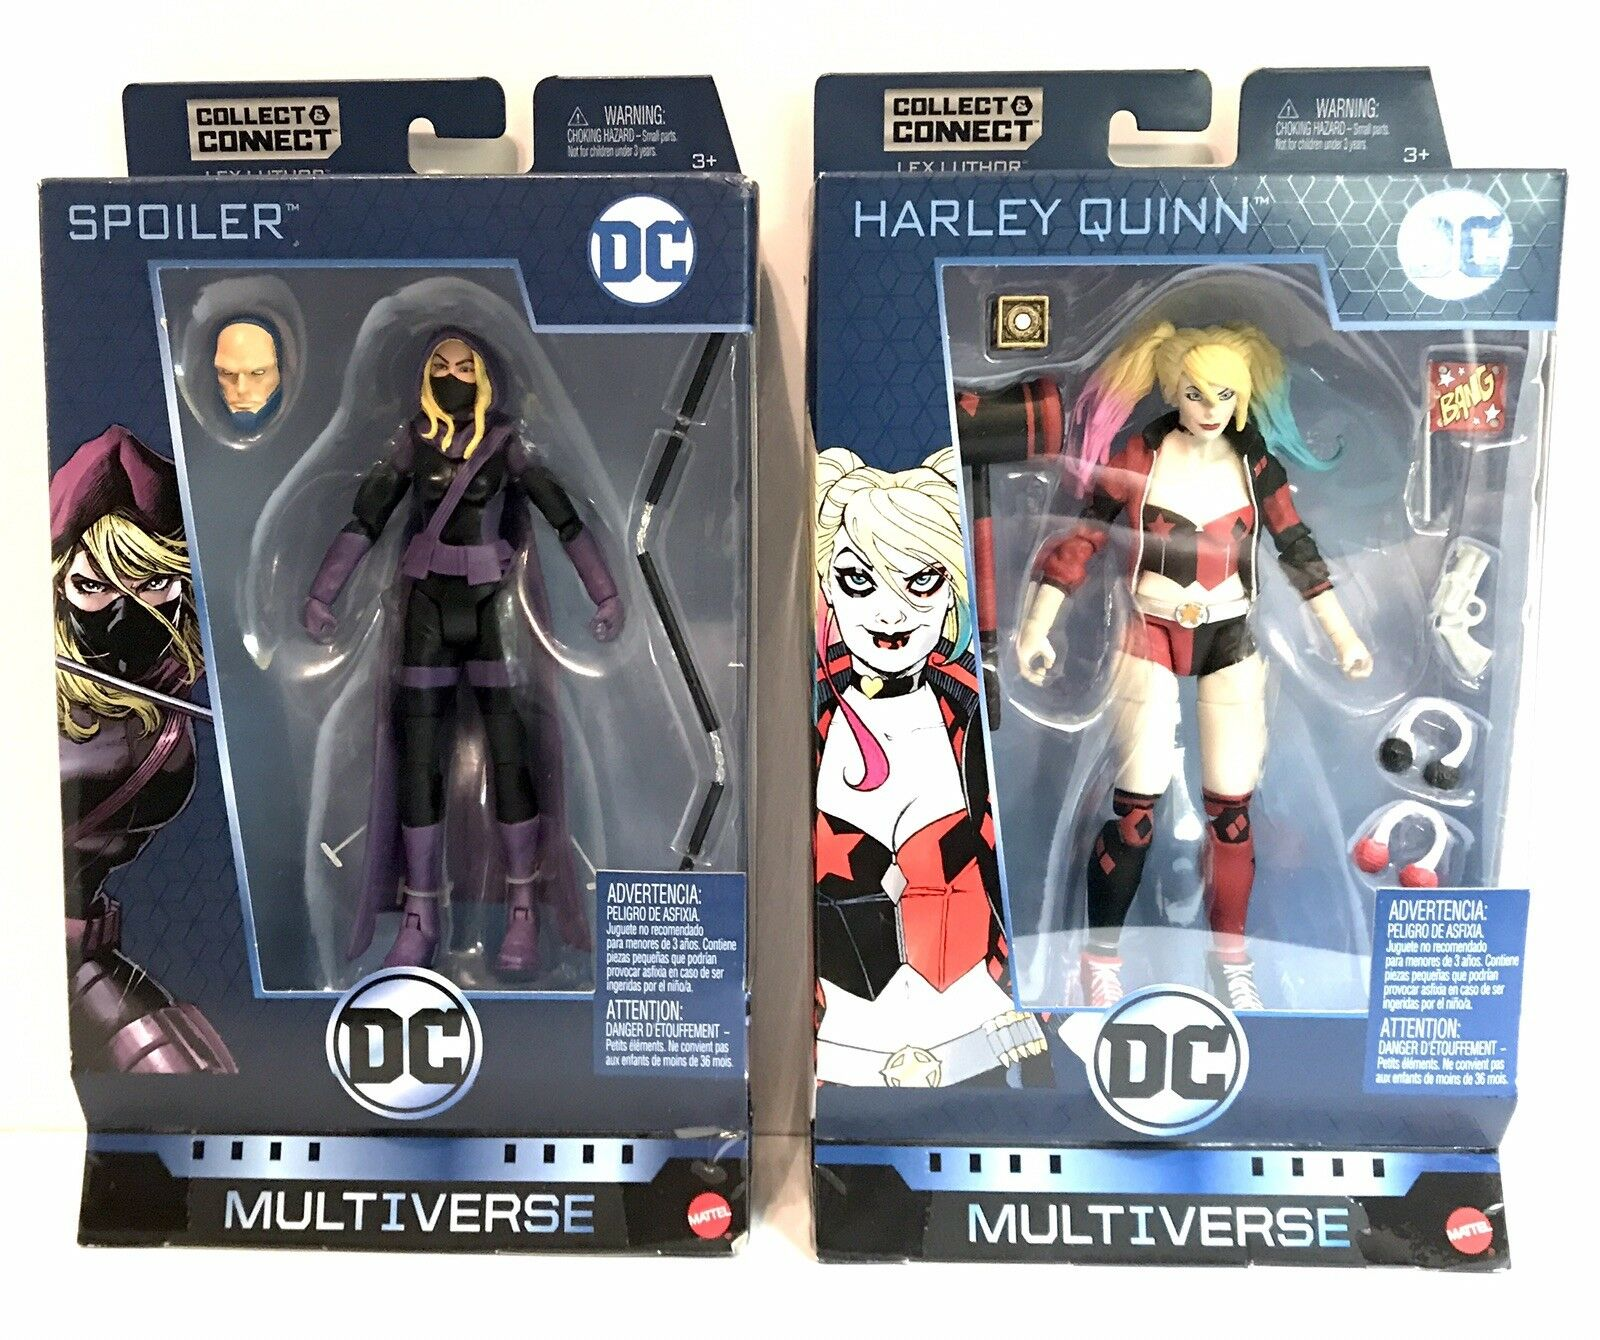 Dc comics multiversum - & harley quinn - lex luthor welle  exklusiv